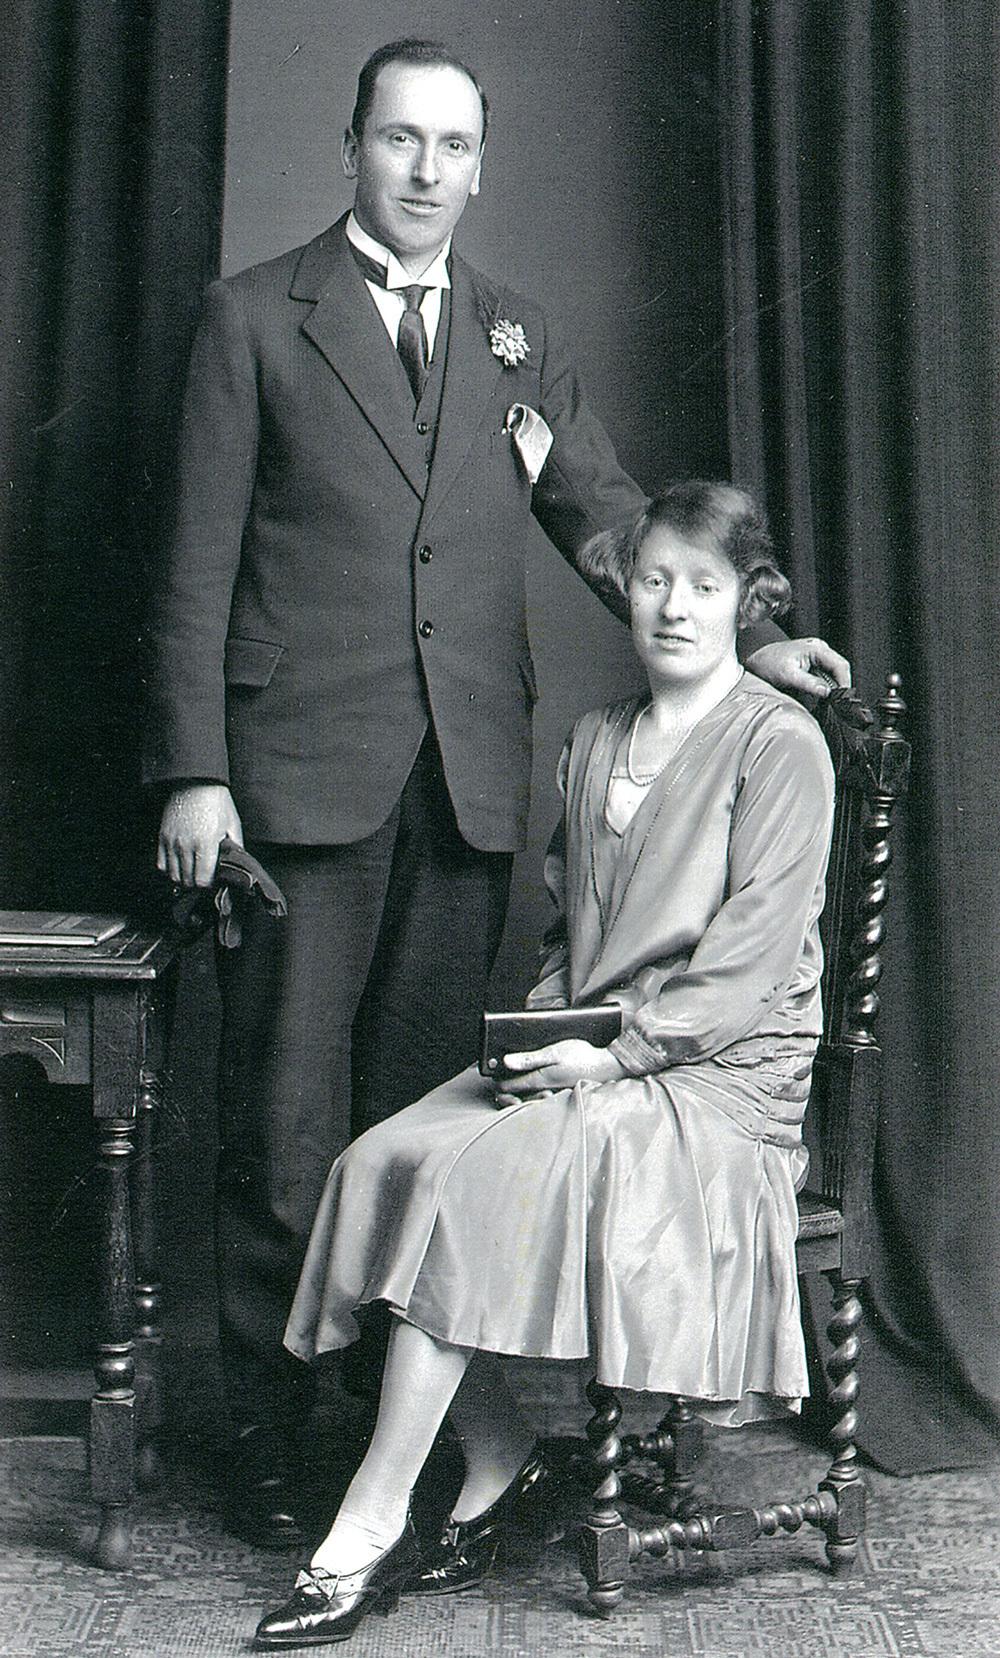 Studio Portrait Bride And Bridegroom On Their Wedding Day 1929